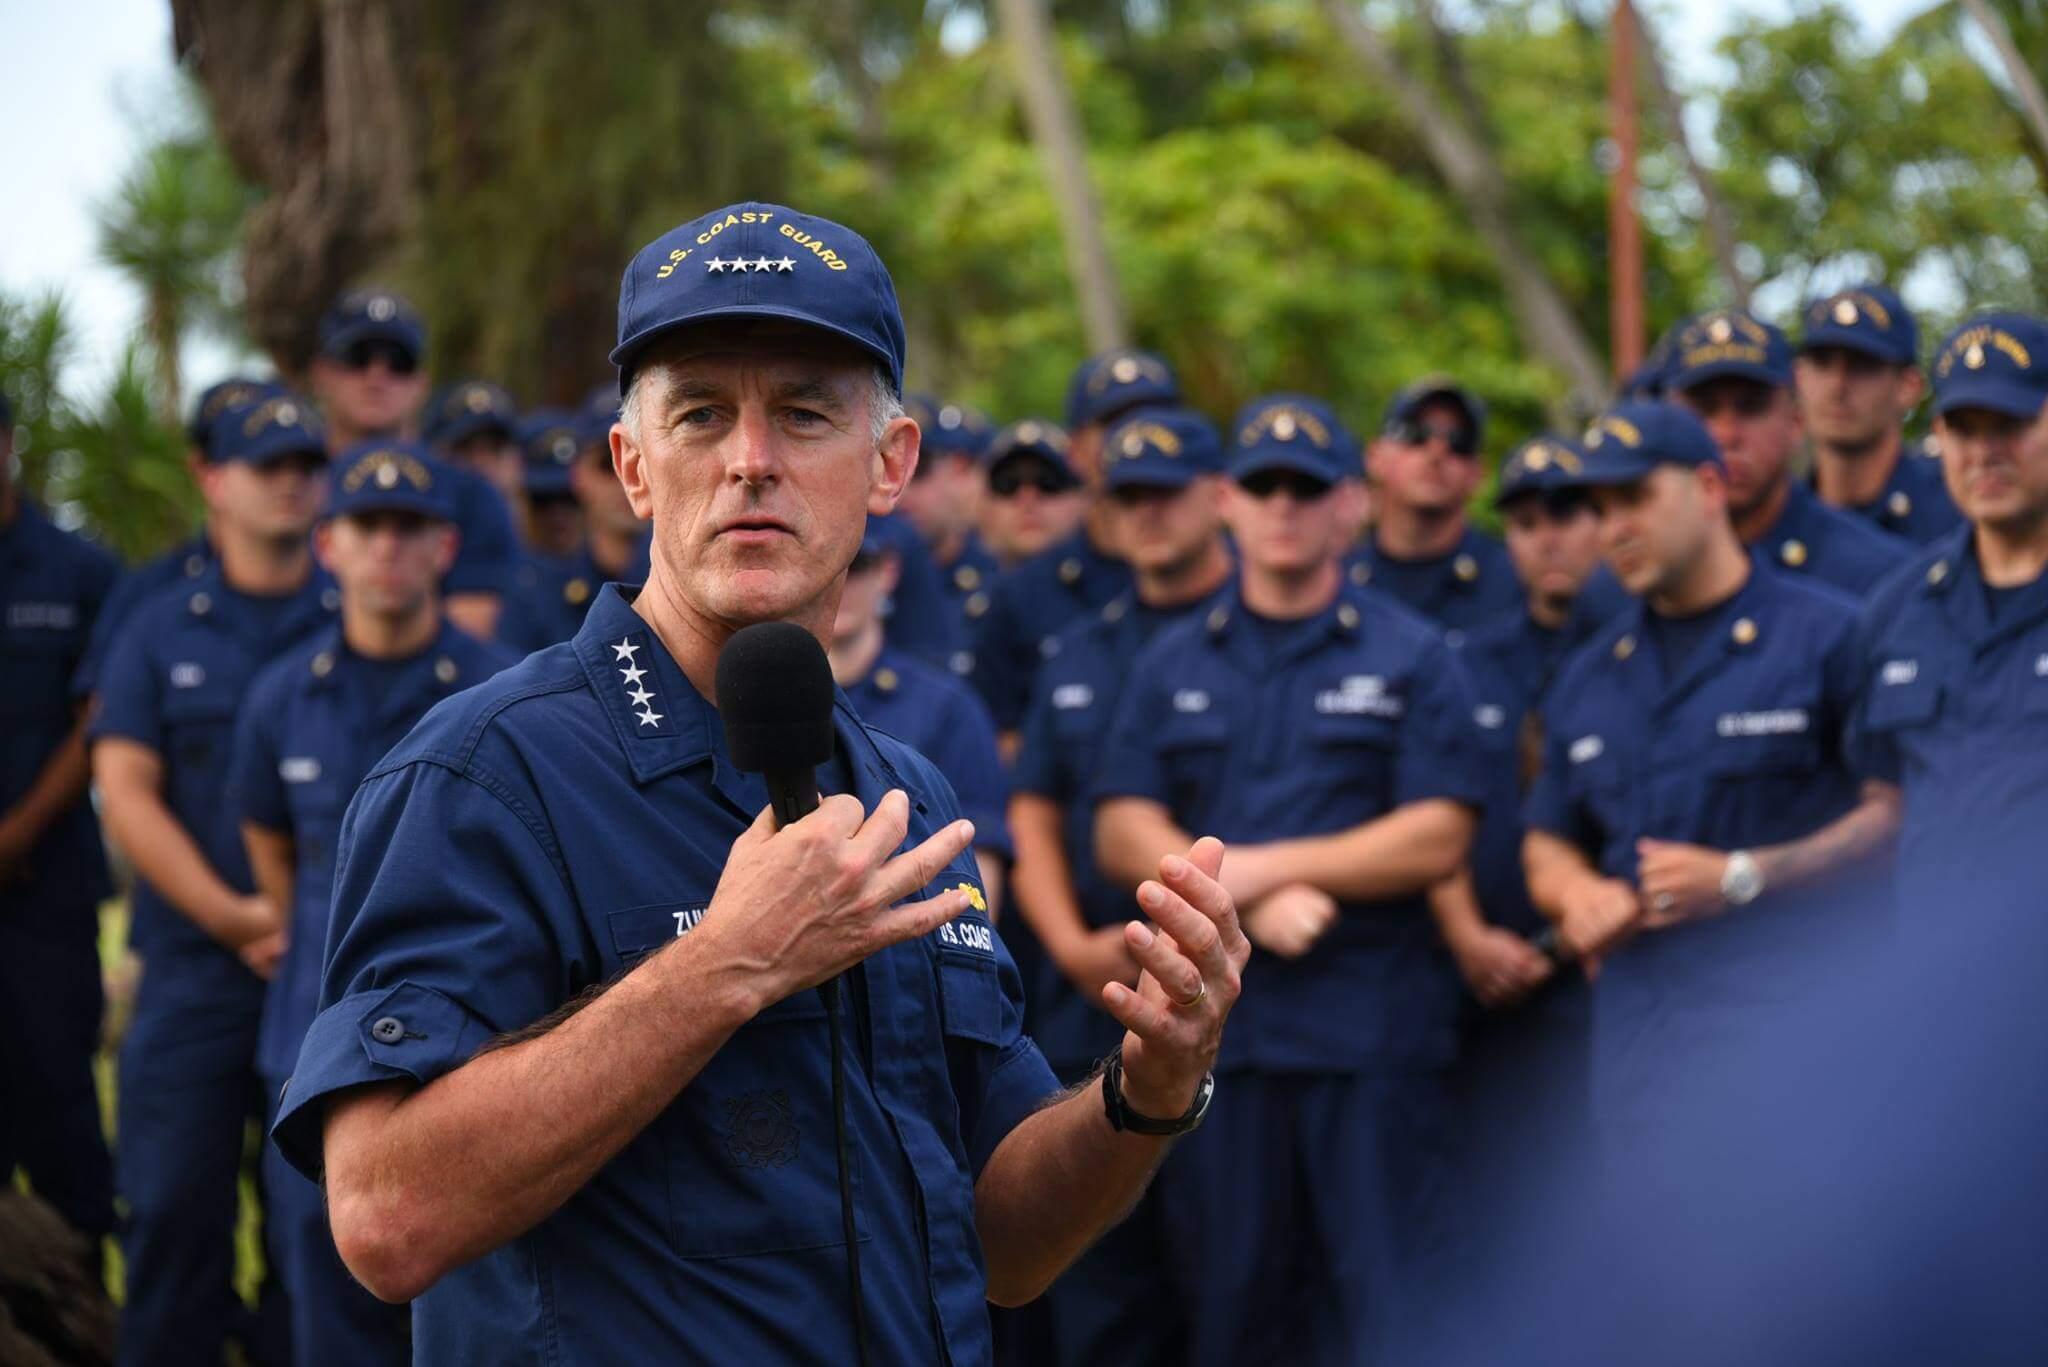 Ross Pepper Team US Coast Guard